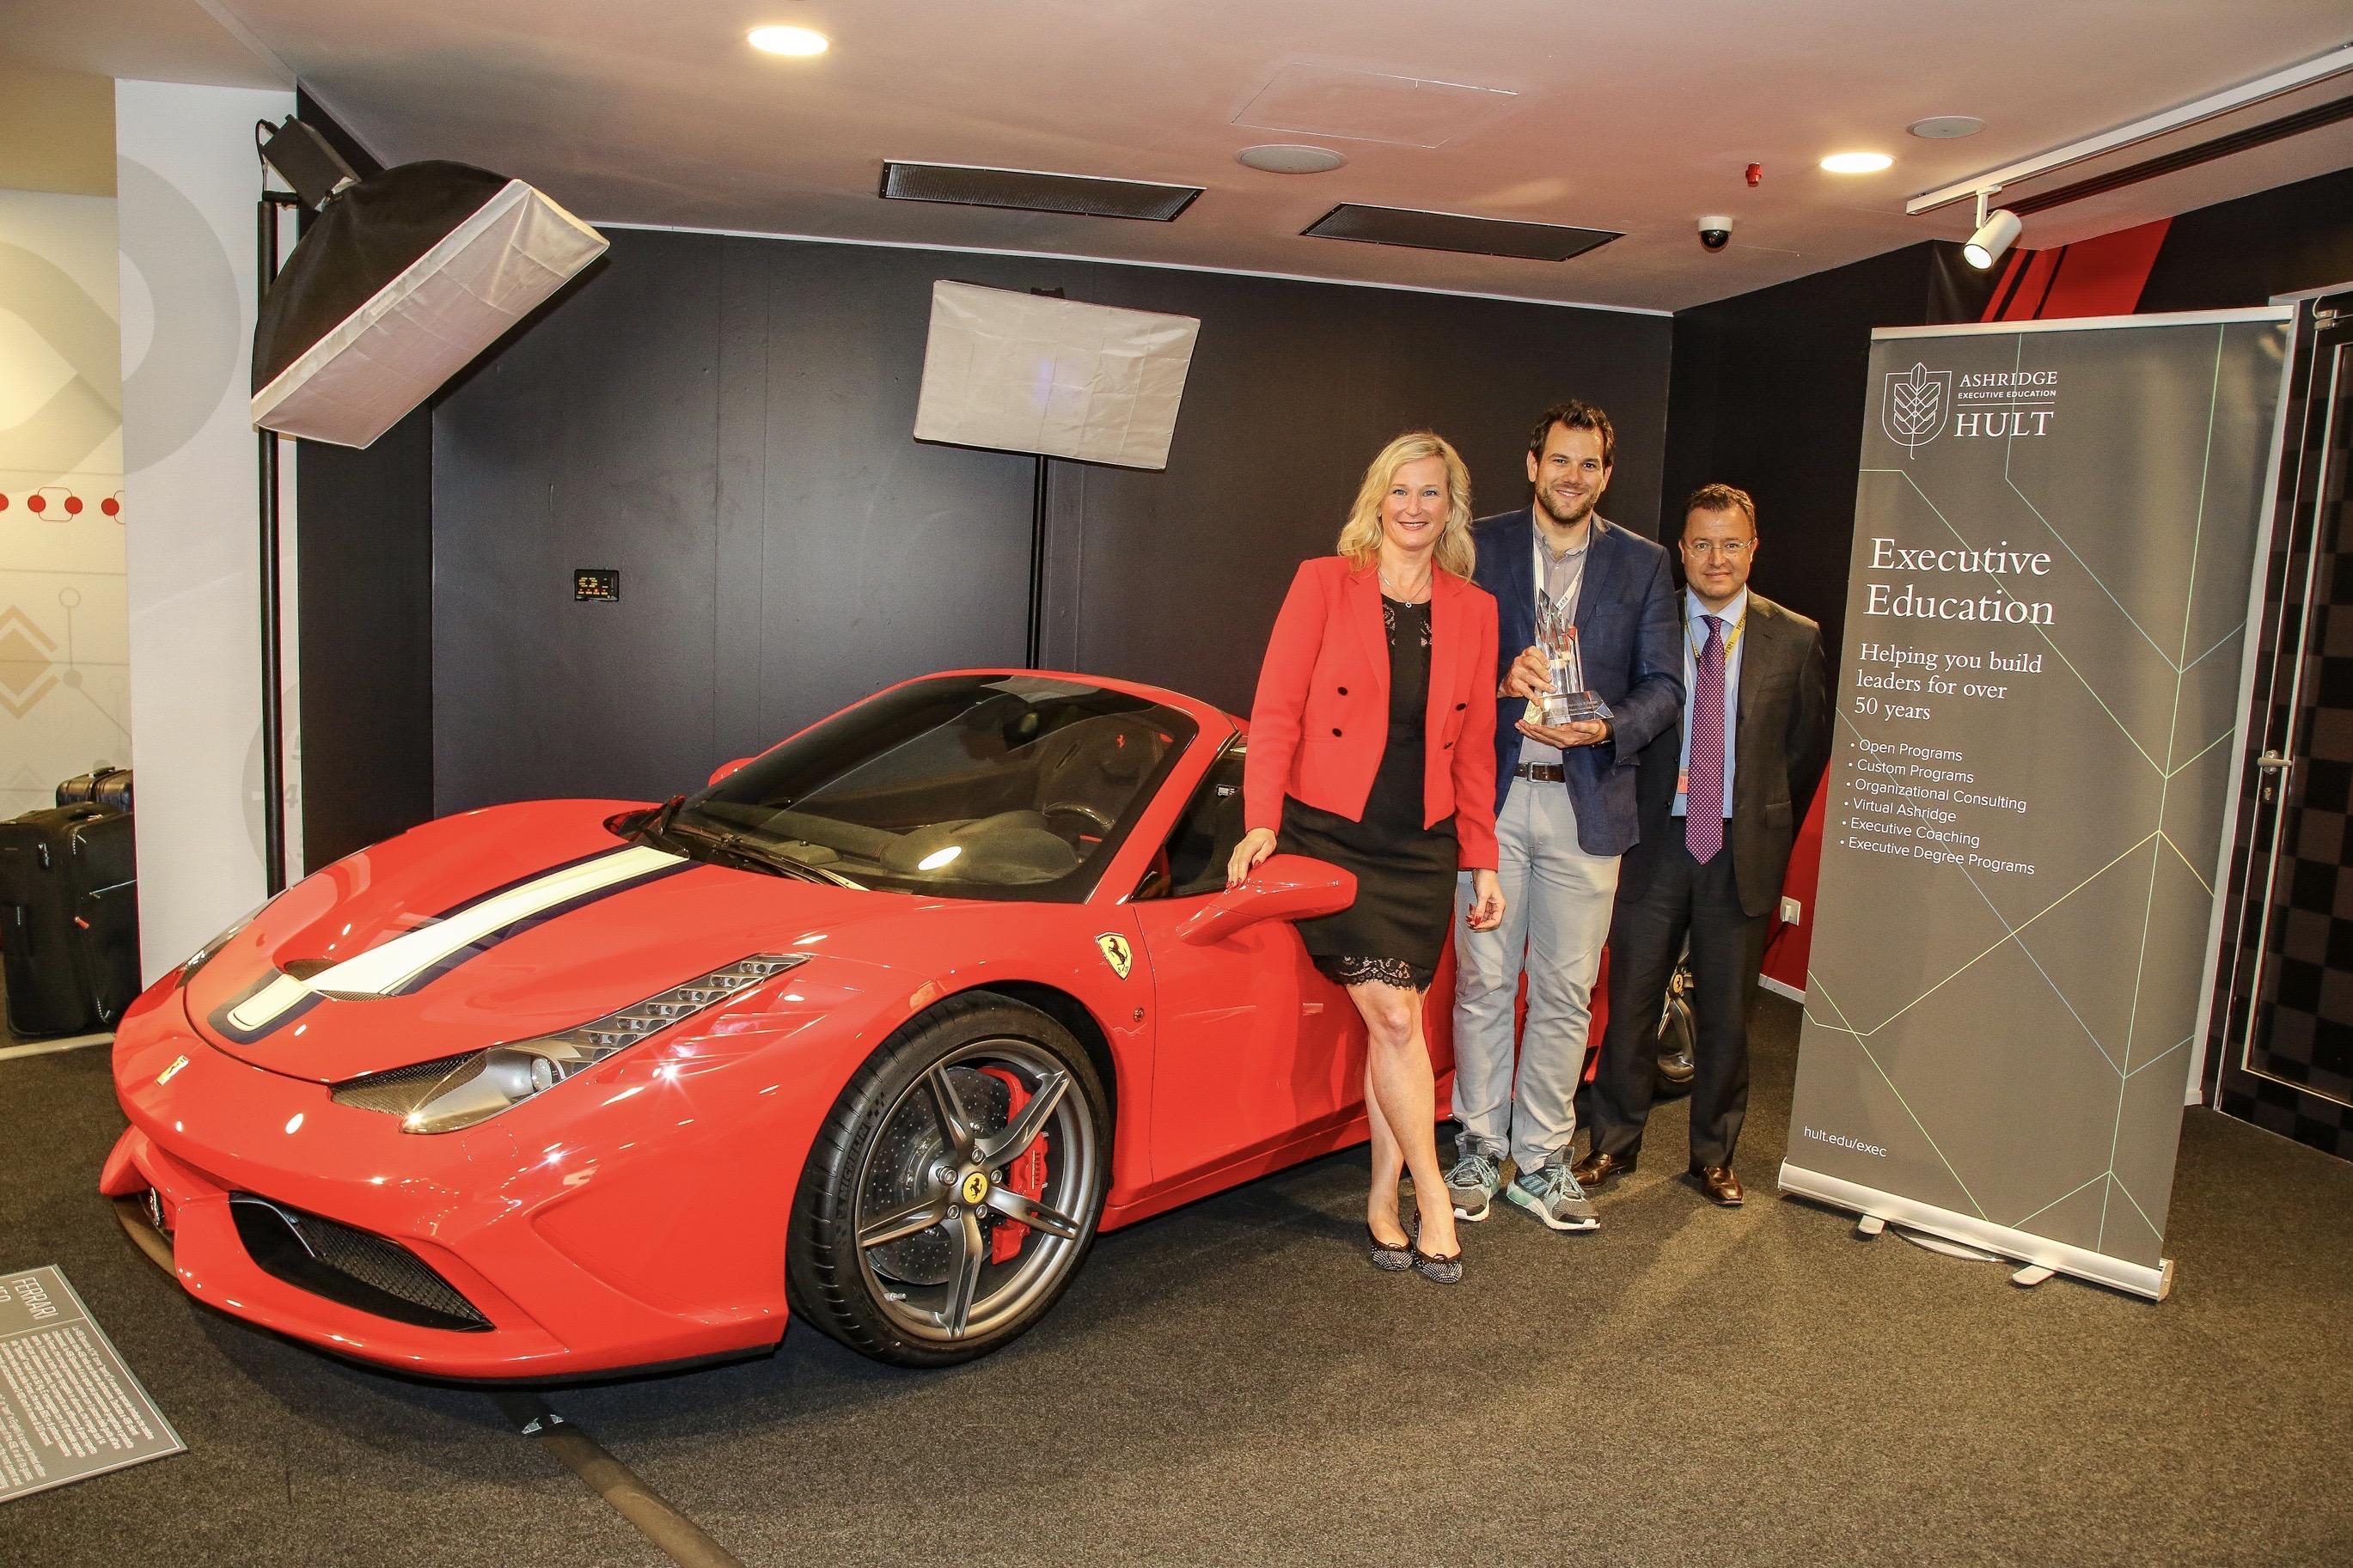 Ashridge Preisverleihung Digital Transformer 2018 bei Ferrari - Jury und Gewinner